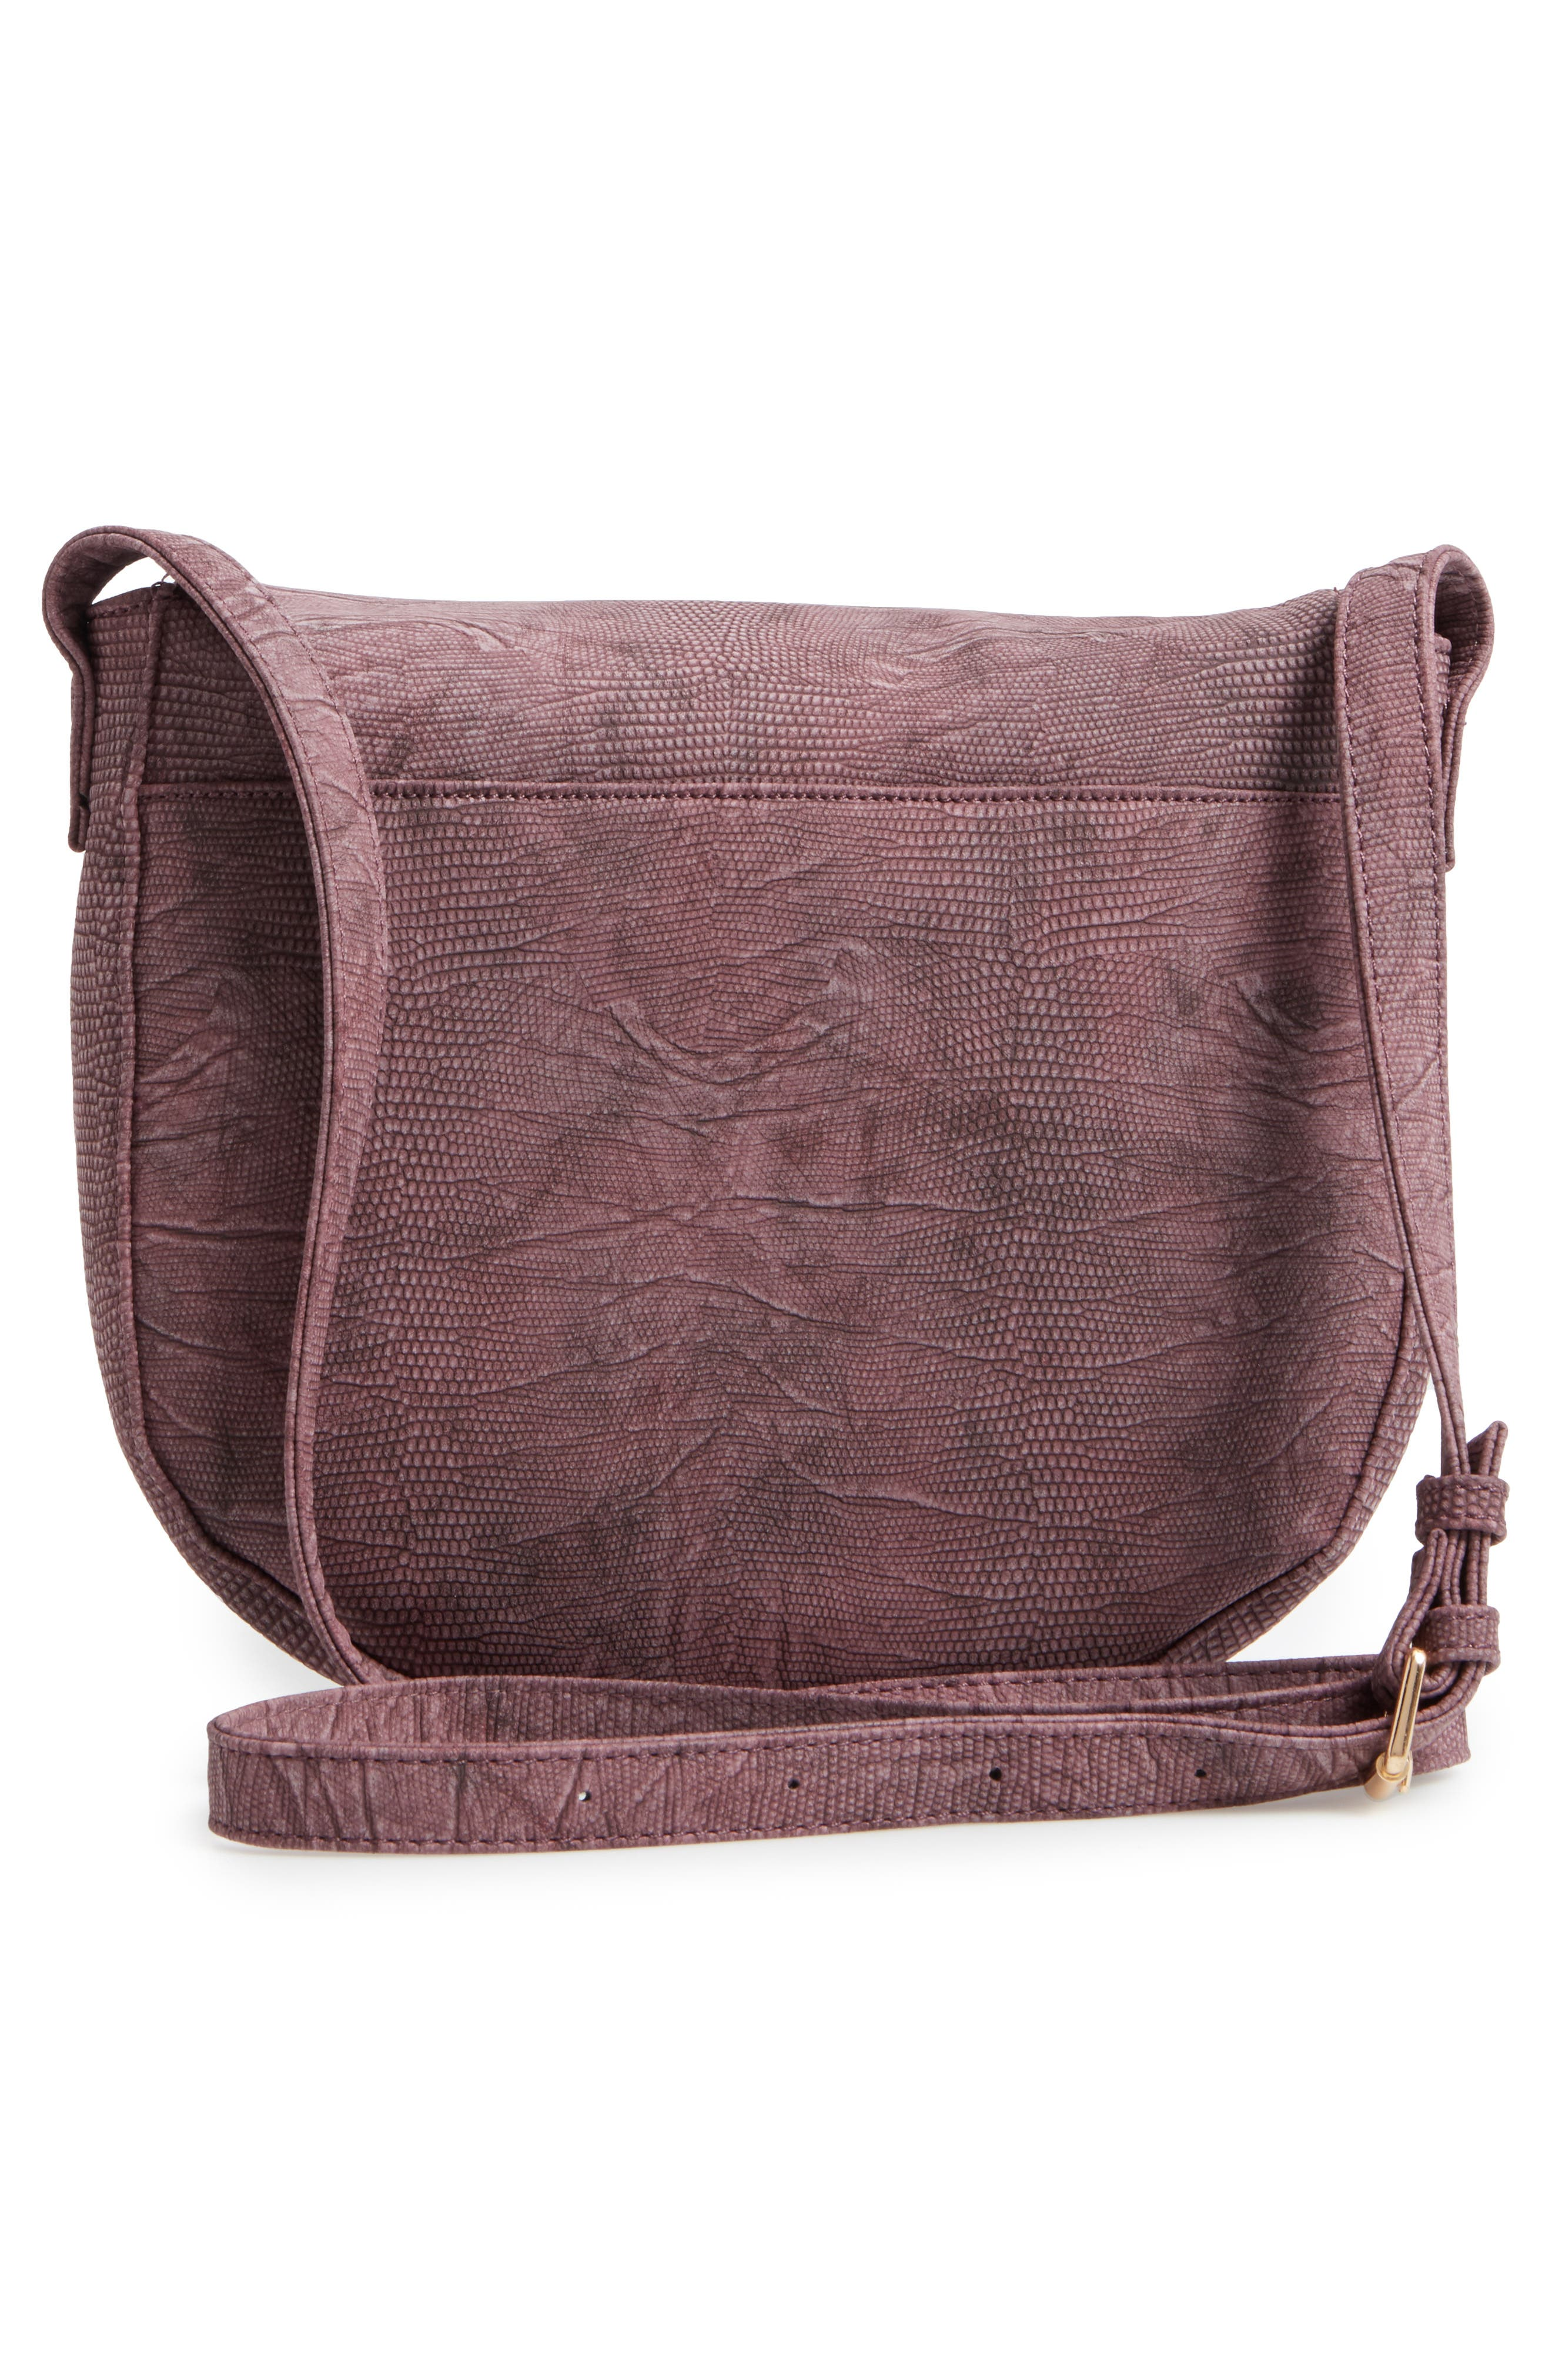 Livvy Faux Leather Crossbody Saddle Bag,                             Alternate thumbnail 3, color,                             Oxblood